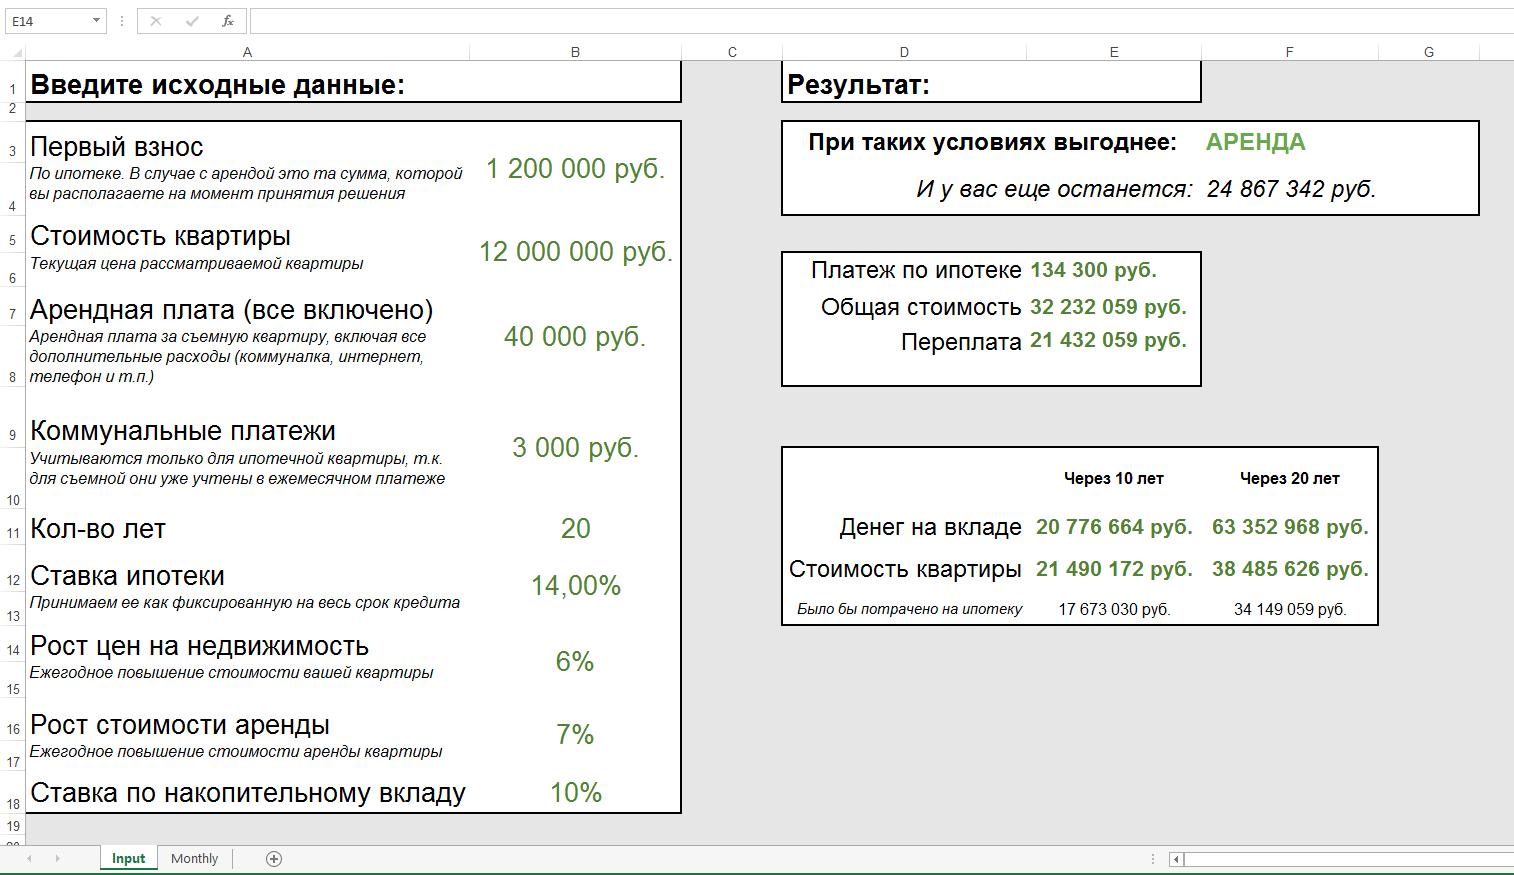 Возьмите онлайн займ на карту Сбербанка срочно